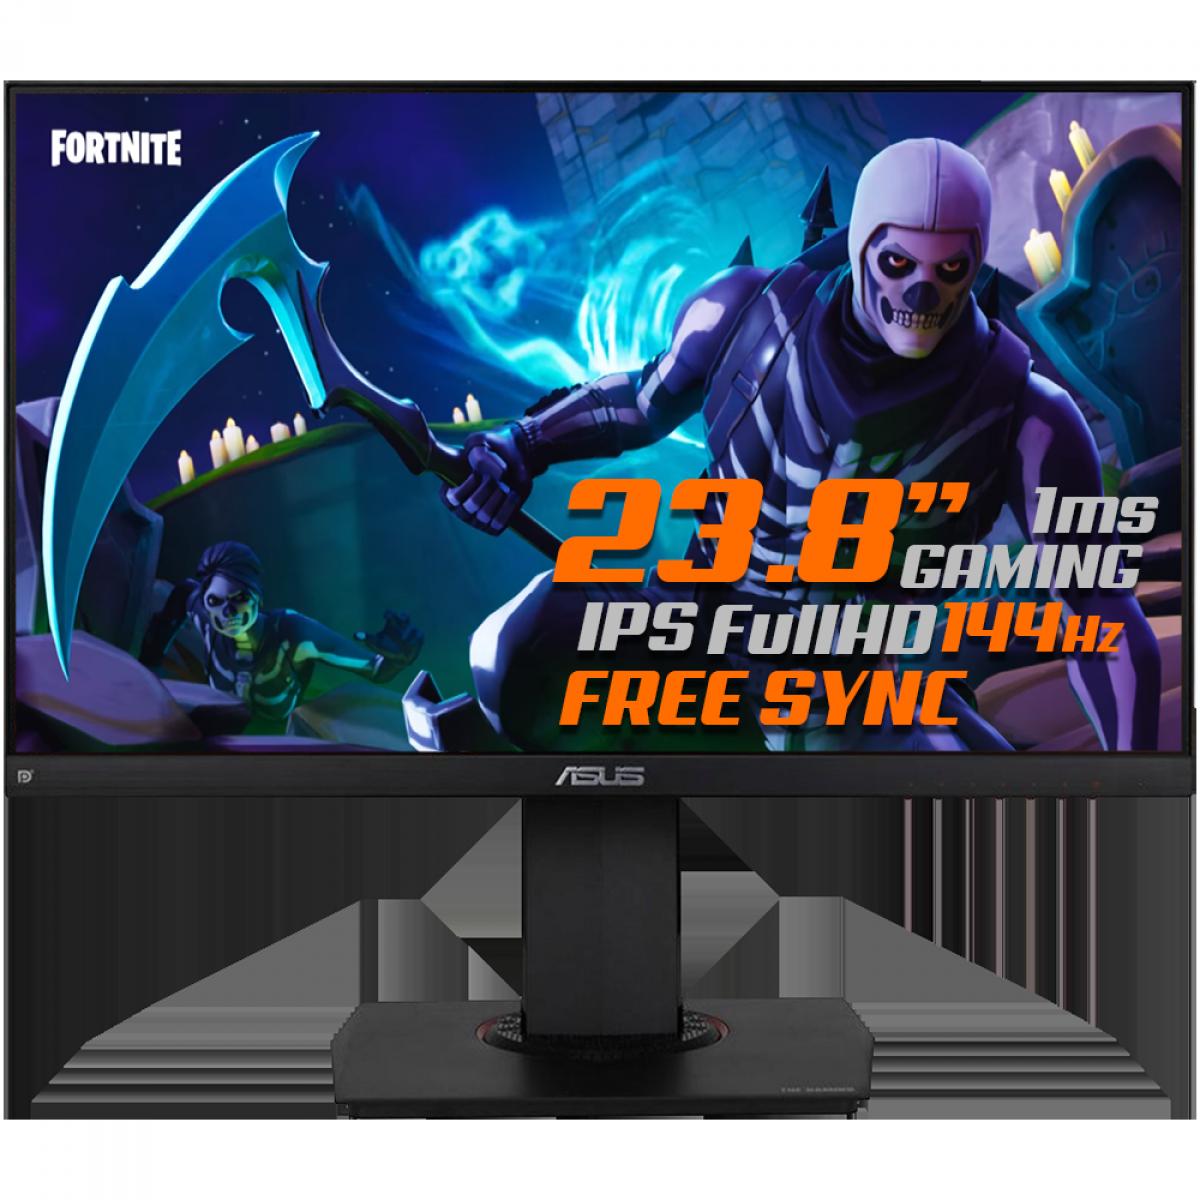 Monitor Gamer Asus TUF Gaming Led 23,8 Pol, Widescreen, Full HD, 144Hz, 1ms, IPS, HDMI, DisplayPort, FreeSync Premium, Altura Ajustável, VG249Q